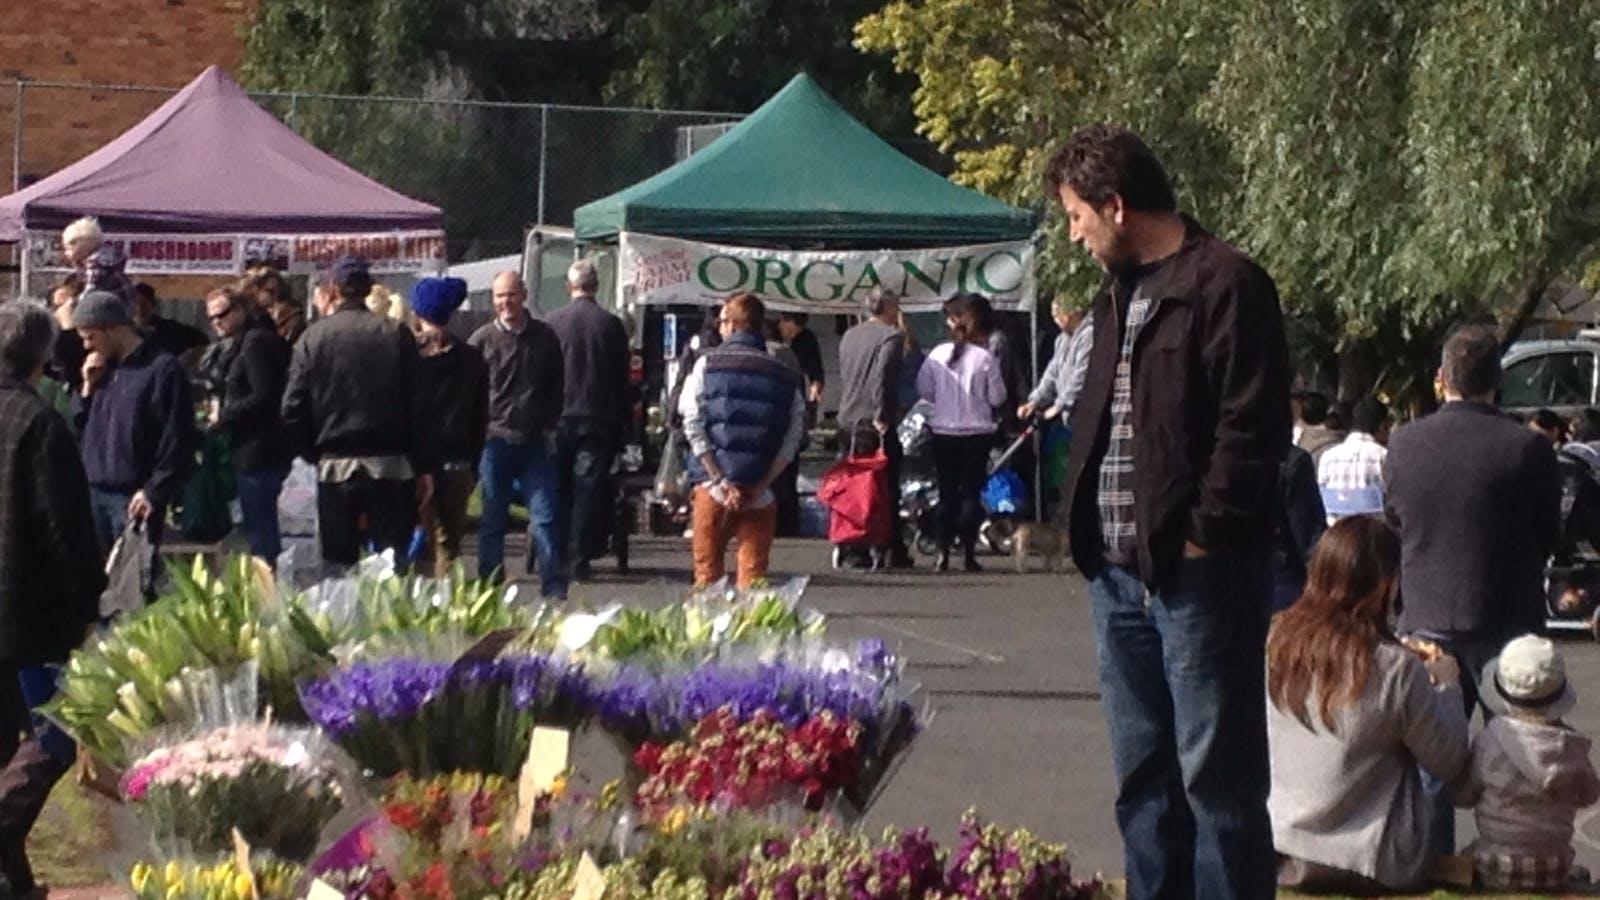 Fresh flowers at Flemington Farmers Market